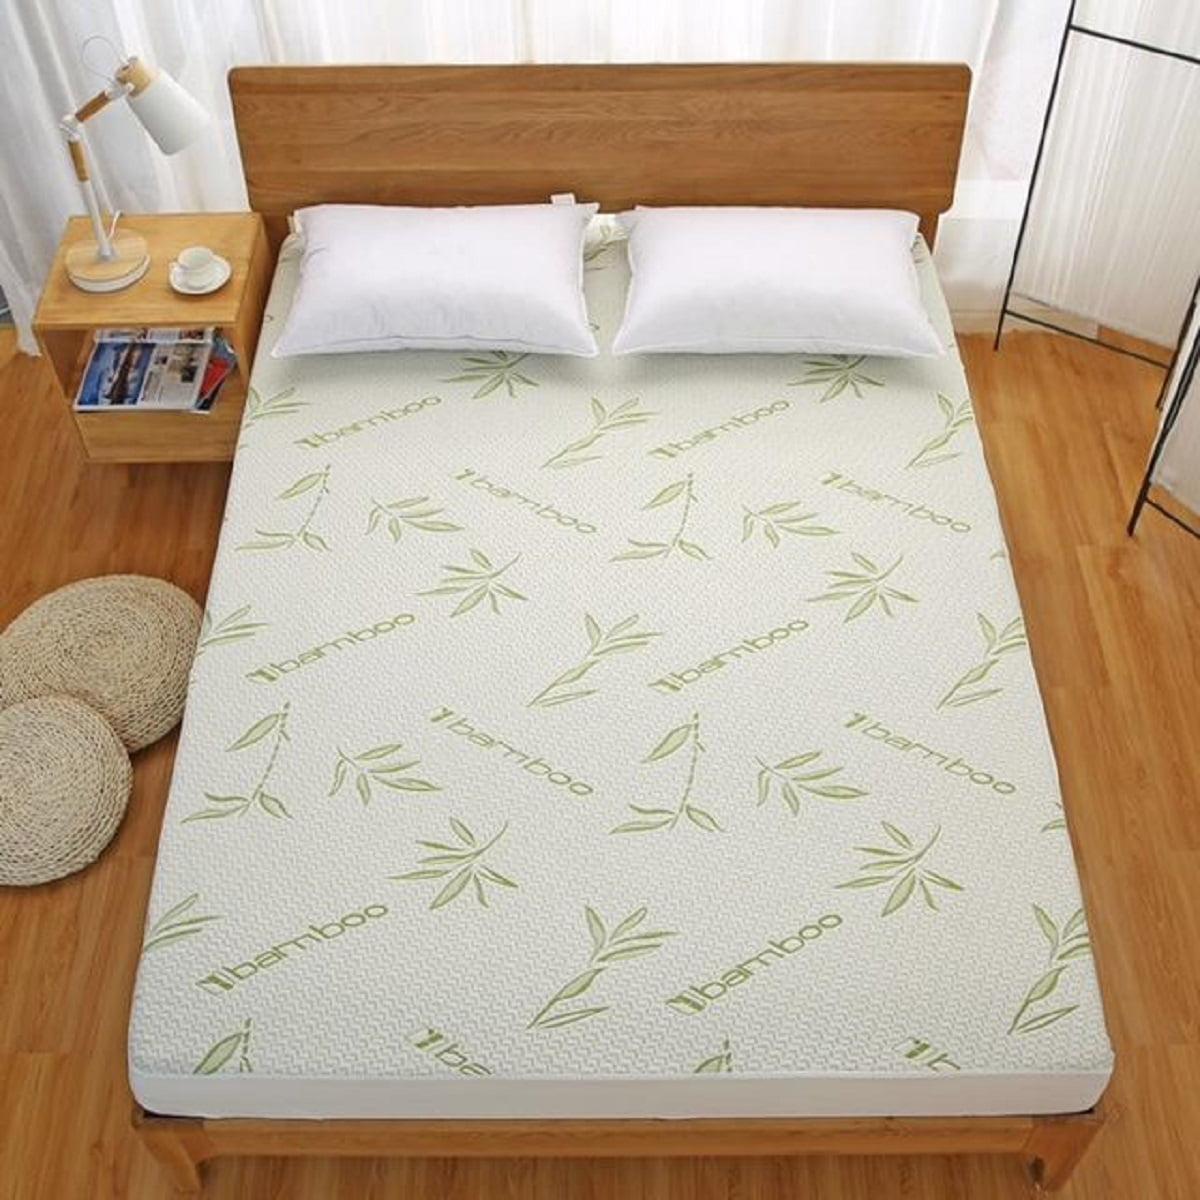 Bamboo Mattress Protector Hypoallergenic Waterproof Cover Pad Walmart Com Walmart Com